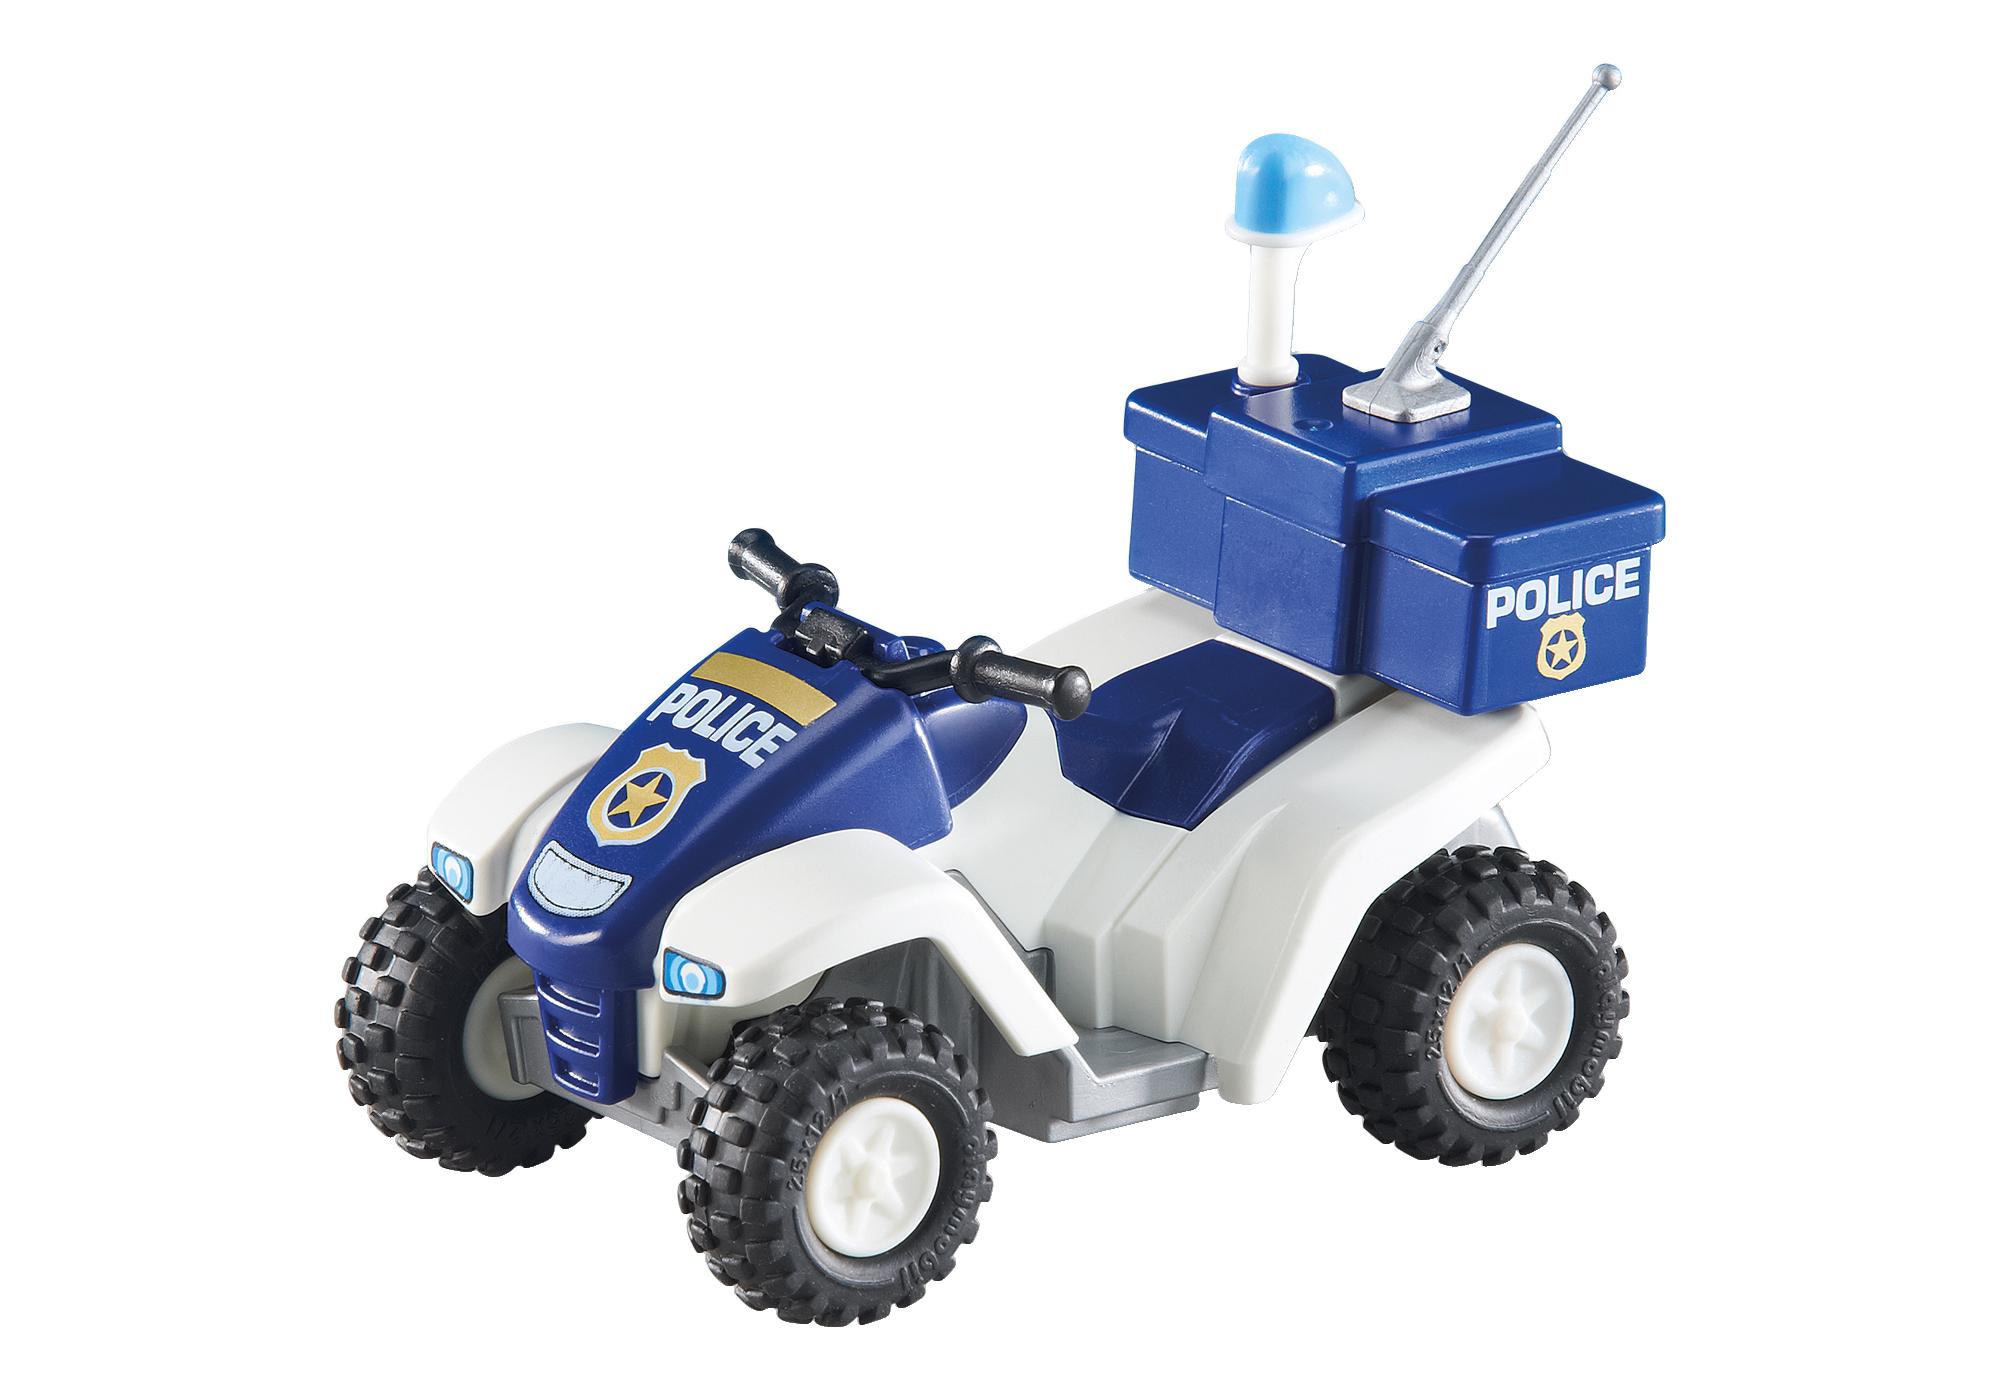 http://media.playmobil.com/i/playmobil/6504_product_detail/Quad della Polizia